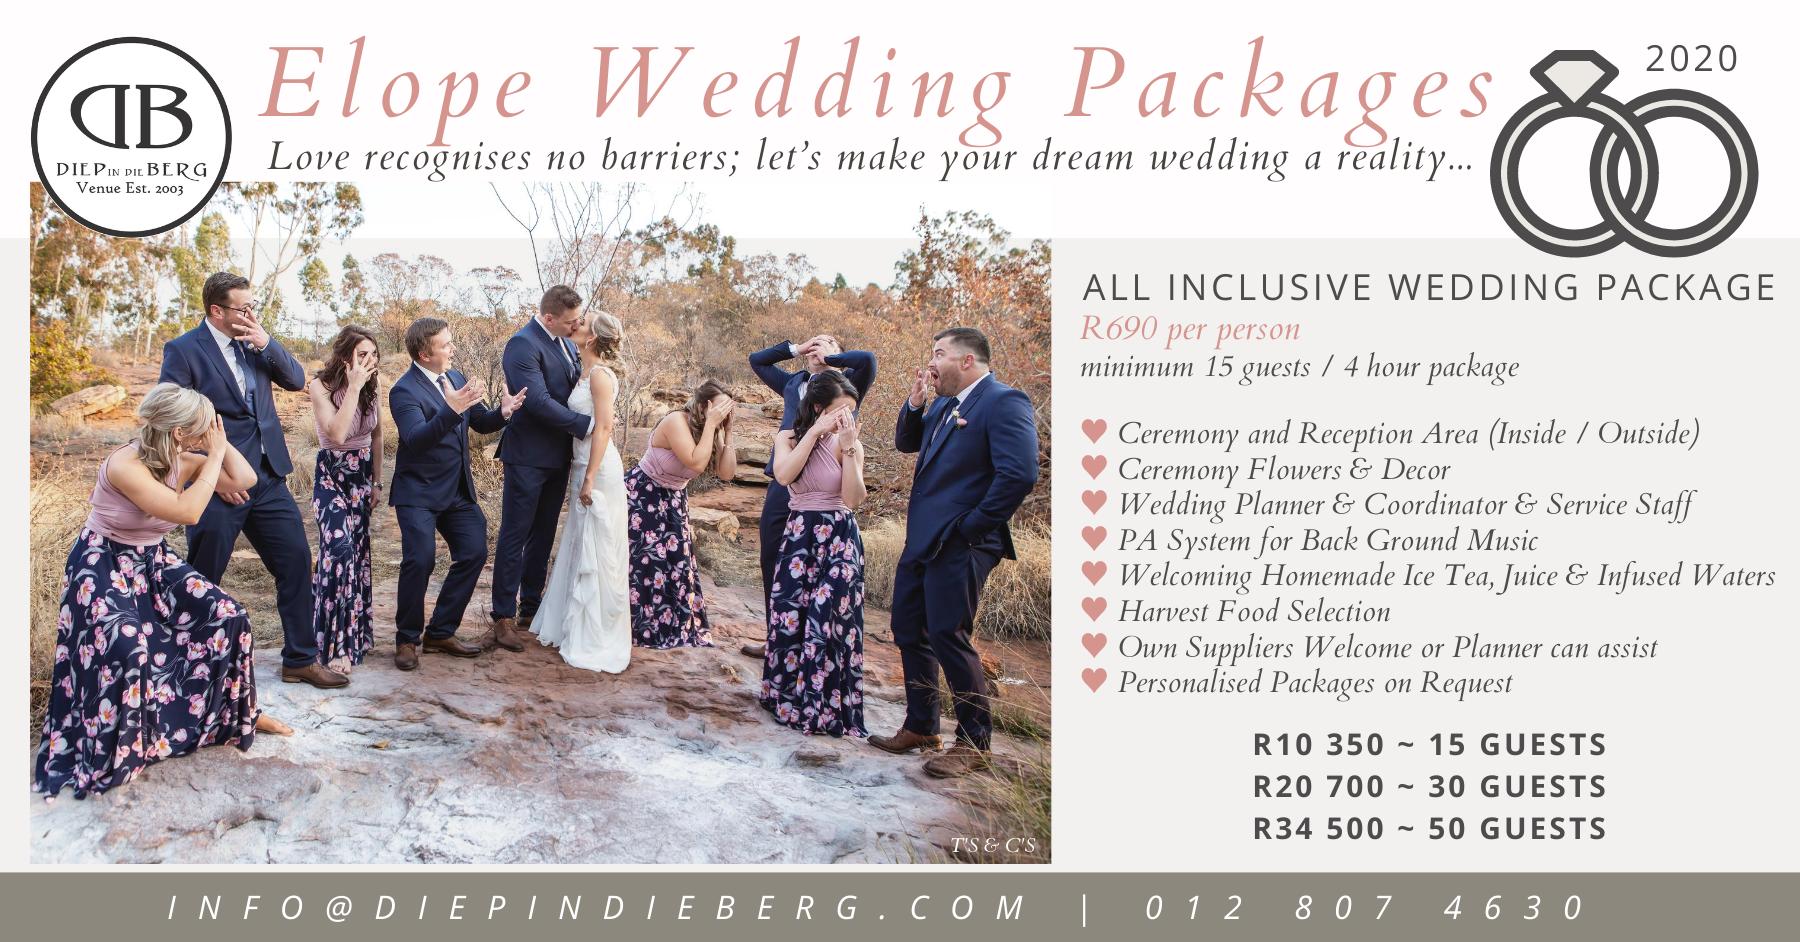 Elopement Weddings Elope Wedding Wedding Package All Inclusive Wedding Packages